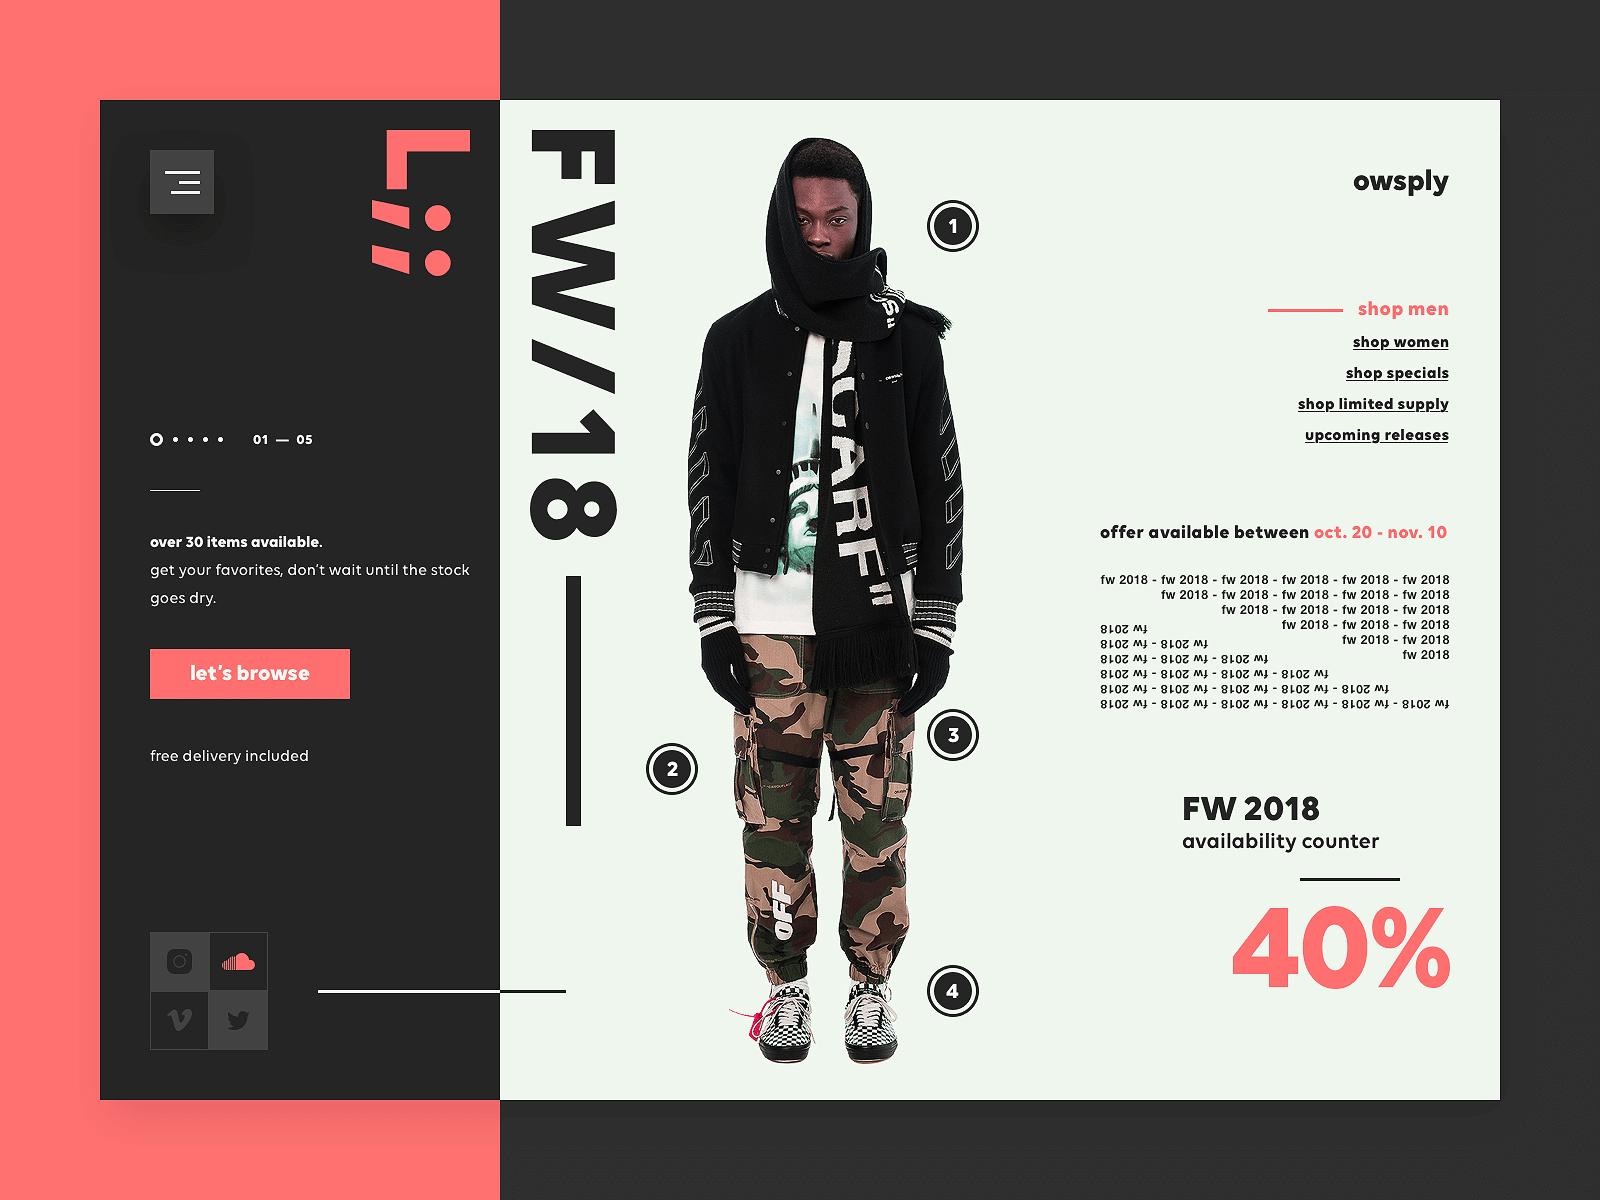 owsply-urban-wear-online-shopping-1